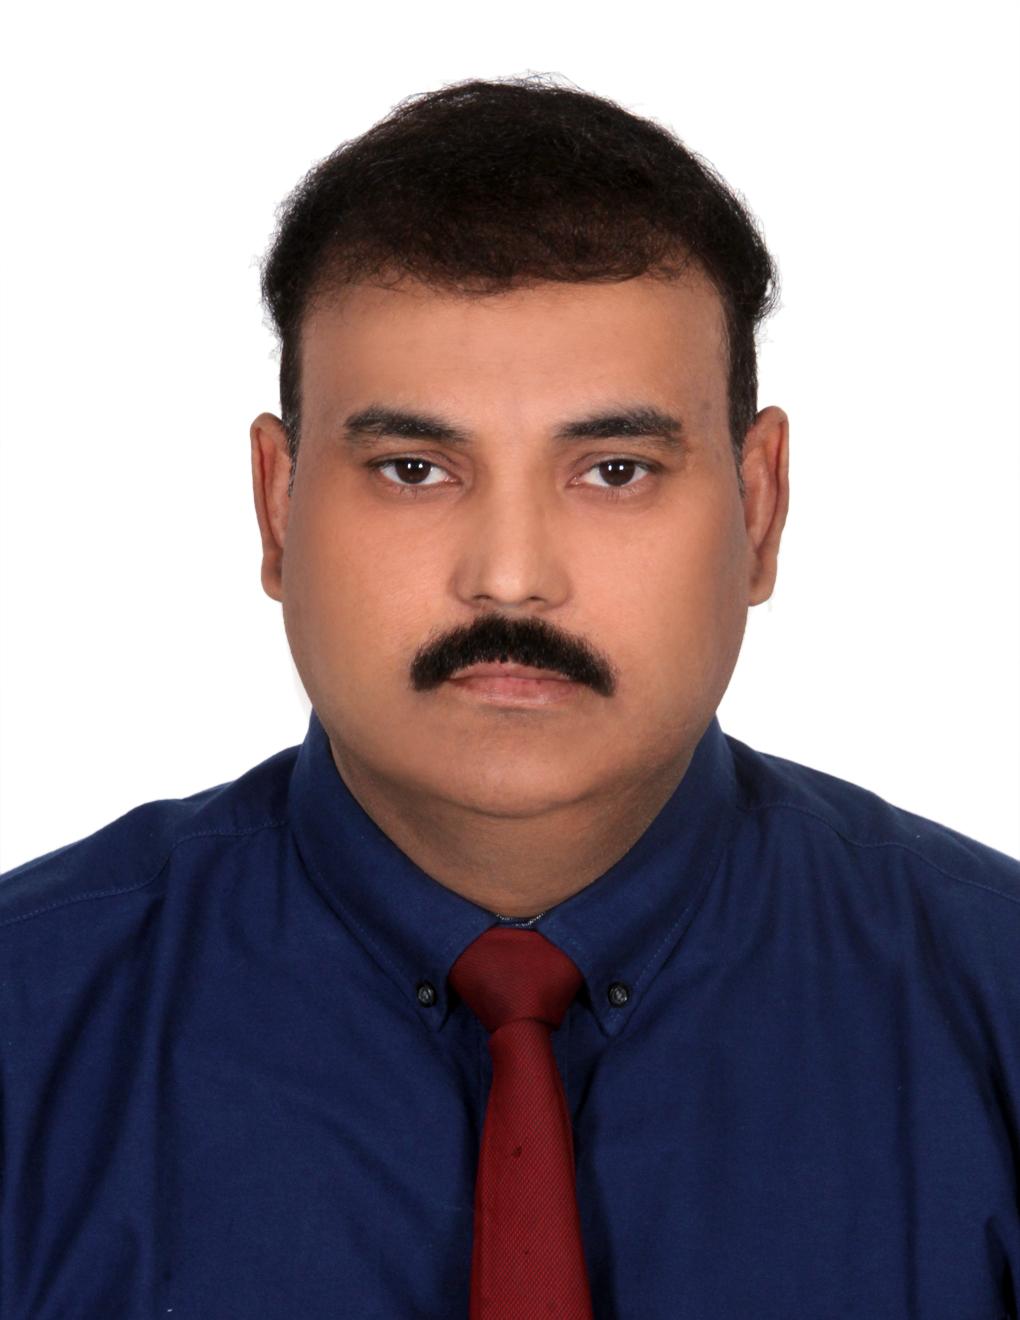 Rahil Tasawar Project Management, Electrical Engineering, Engineering, Construction Monitoring, Power Generation, Bill Of Materials (BOM) Optimization